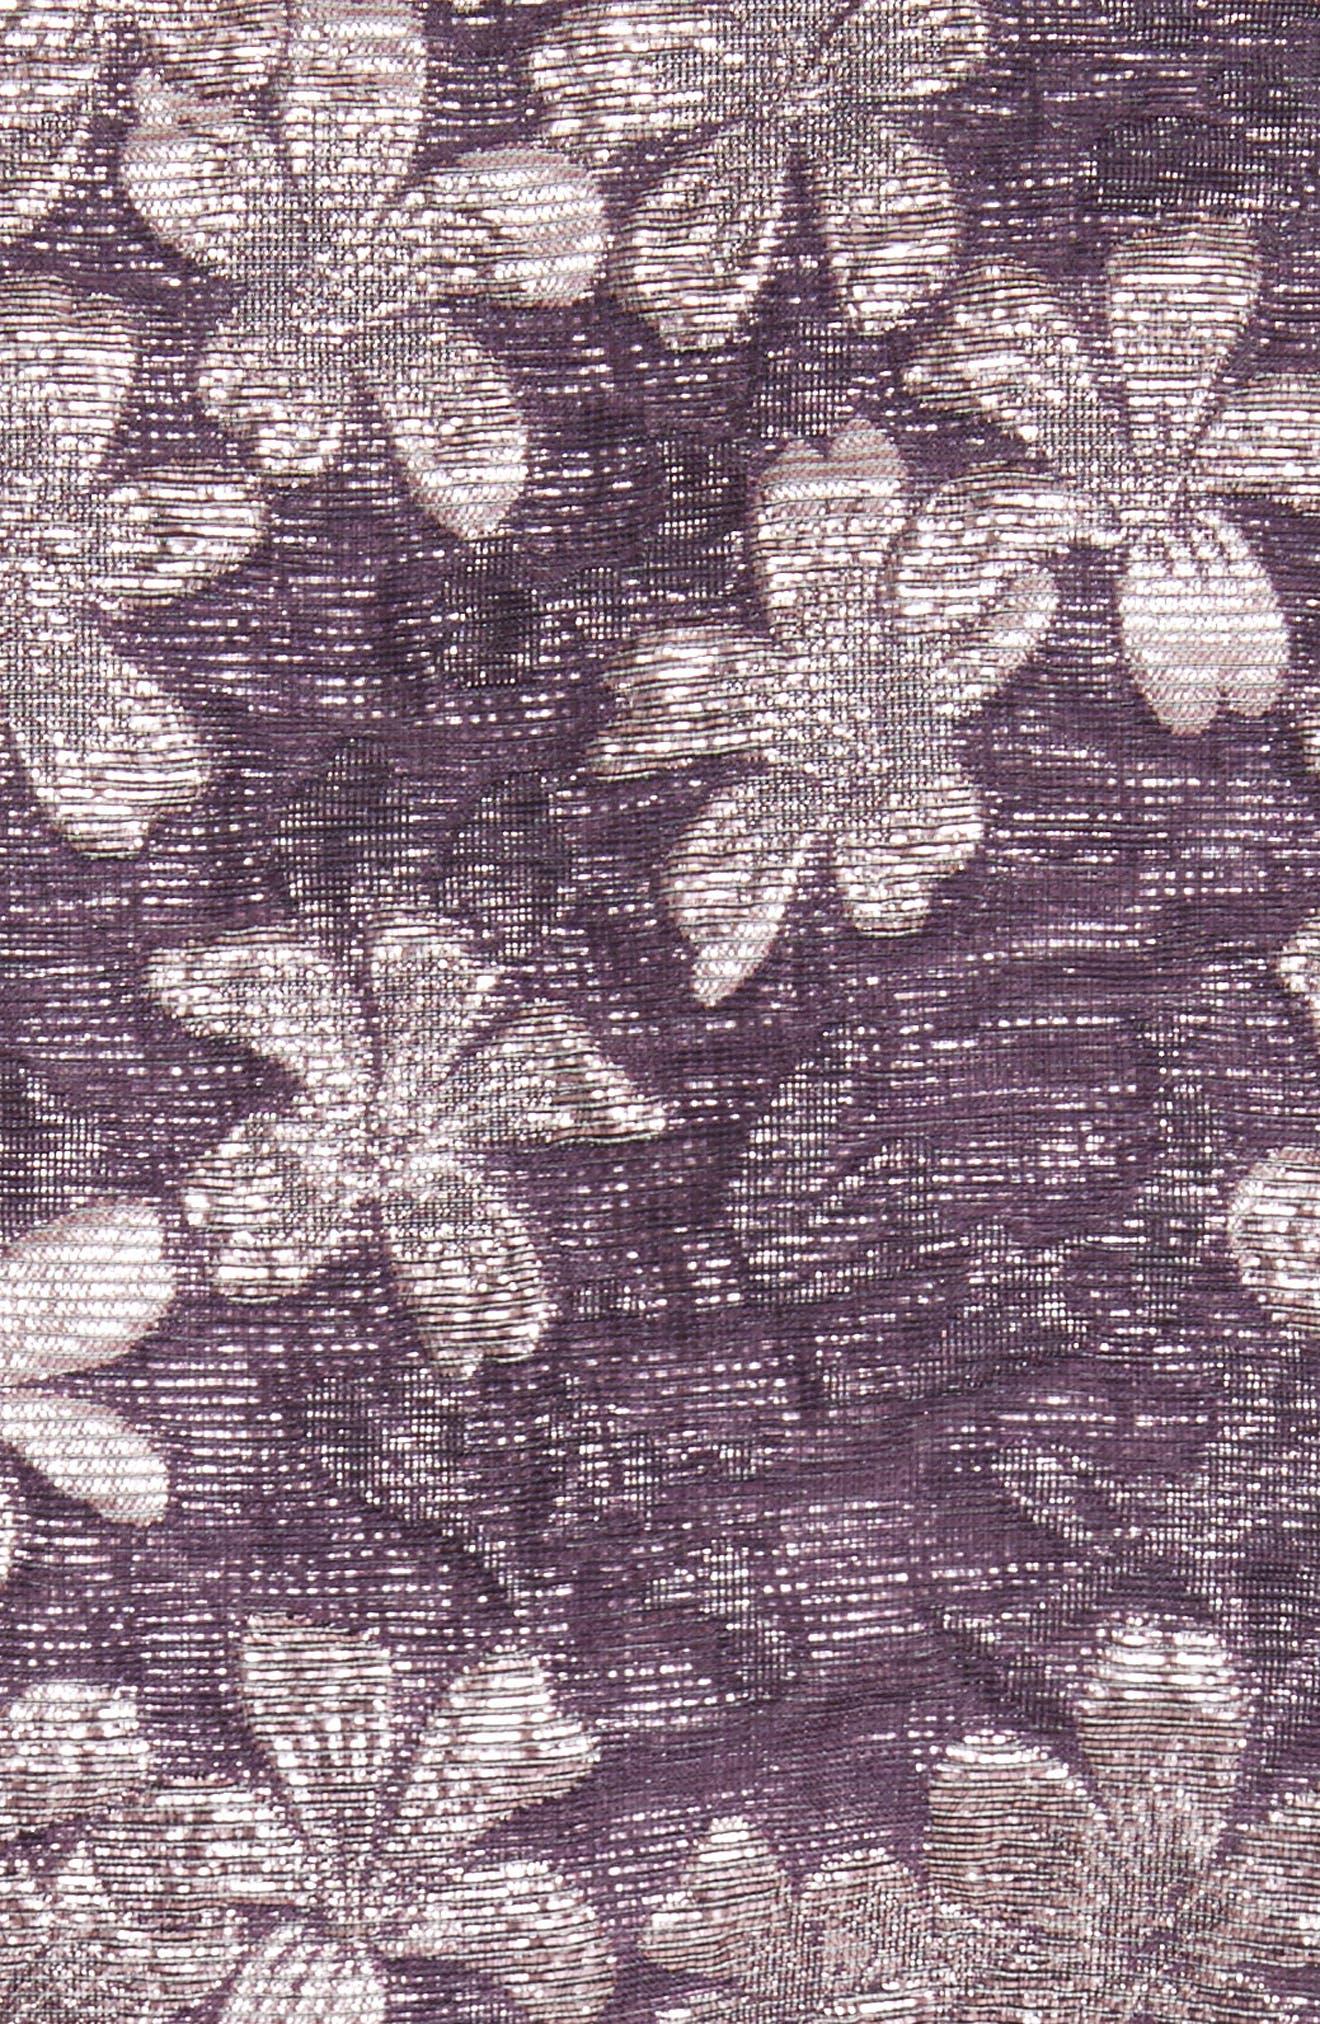 Floral Jacquard Jacket,                             Alternate thumbnail 6, color,                             560